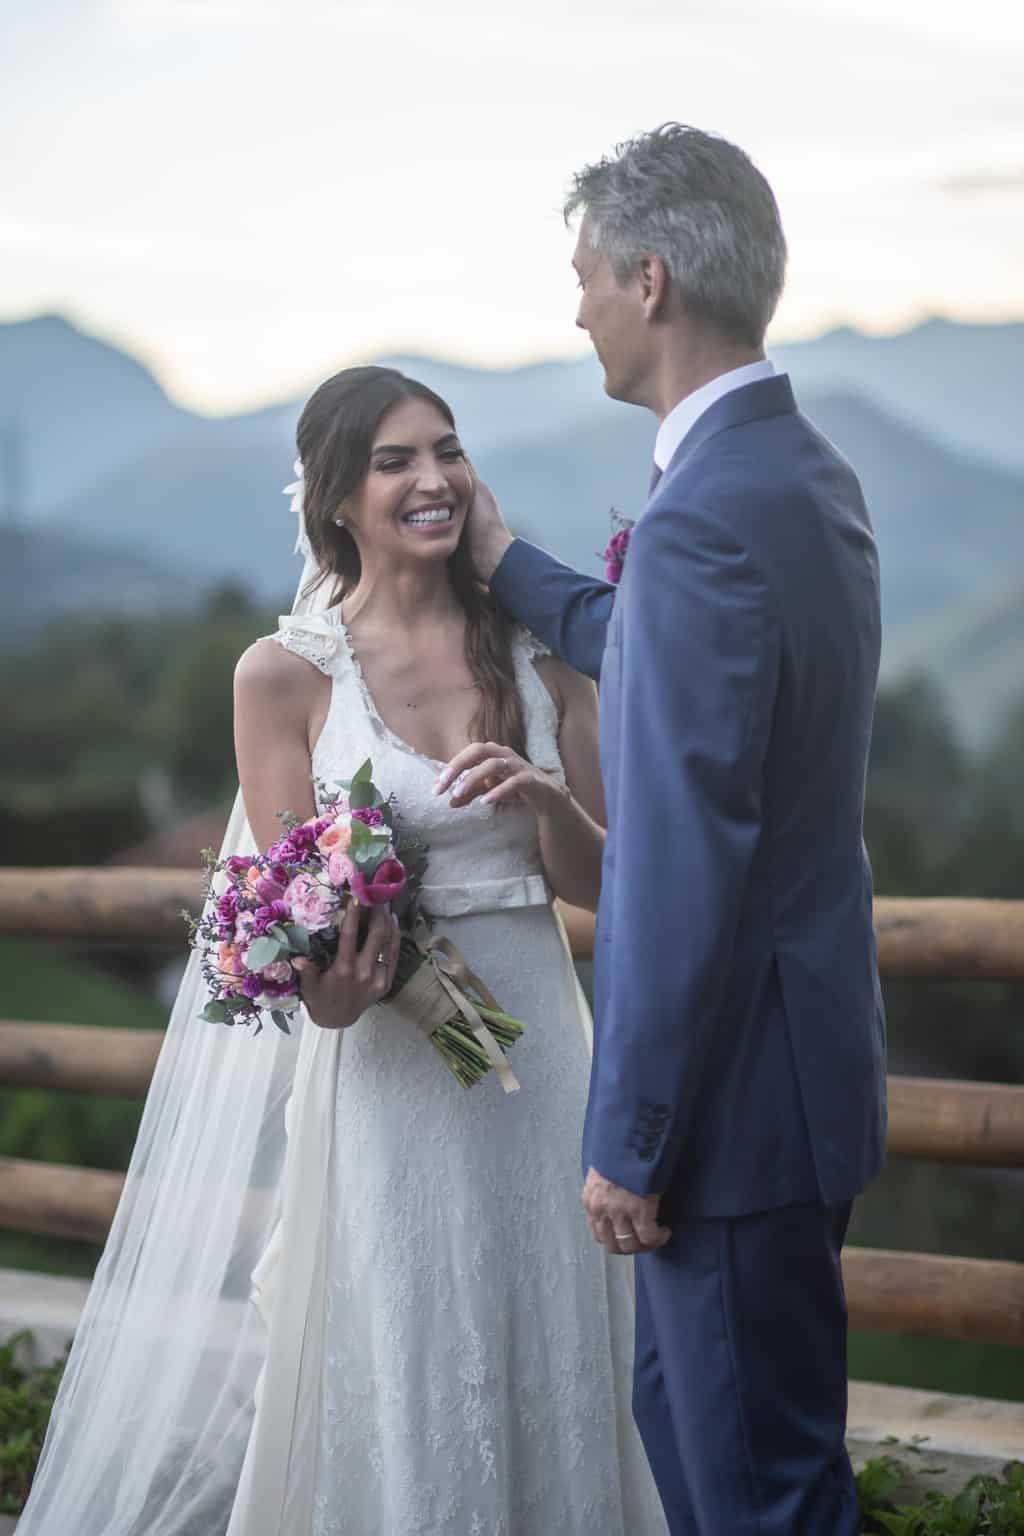 casamento-na-serra-foto-dos-noivos-Fotografia-Laura-Campanella-fotos-a-tarde-graviola-filmes-Juliana-e-Sebastian-noivos-no-altar-Pousada-La-Belle-Bruna93